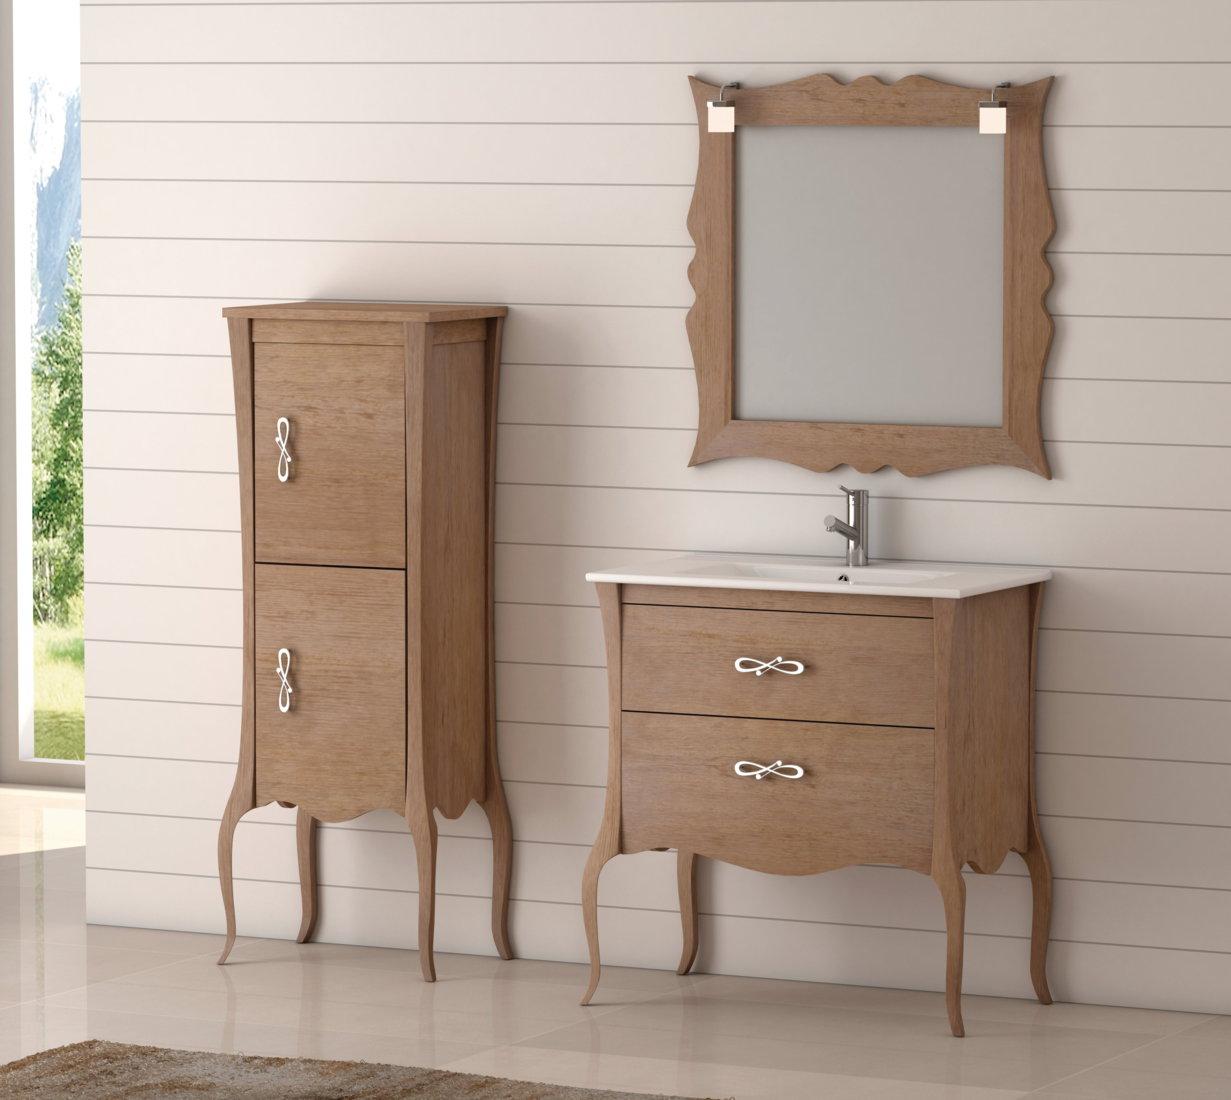 Batoni mueble de ba o de madera modelo niza caf - Bano de madera ...